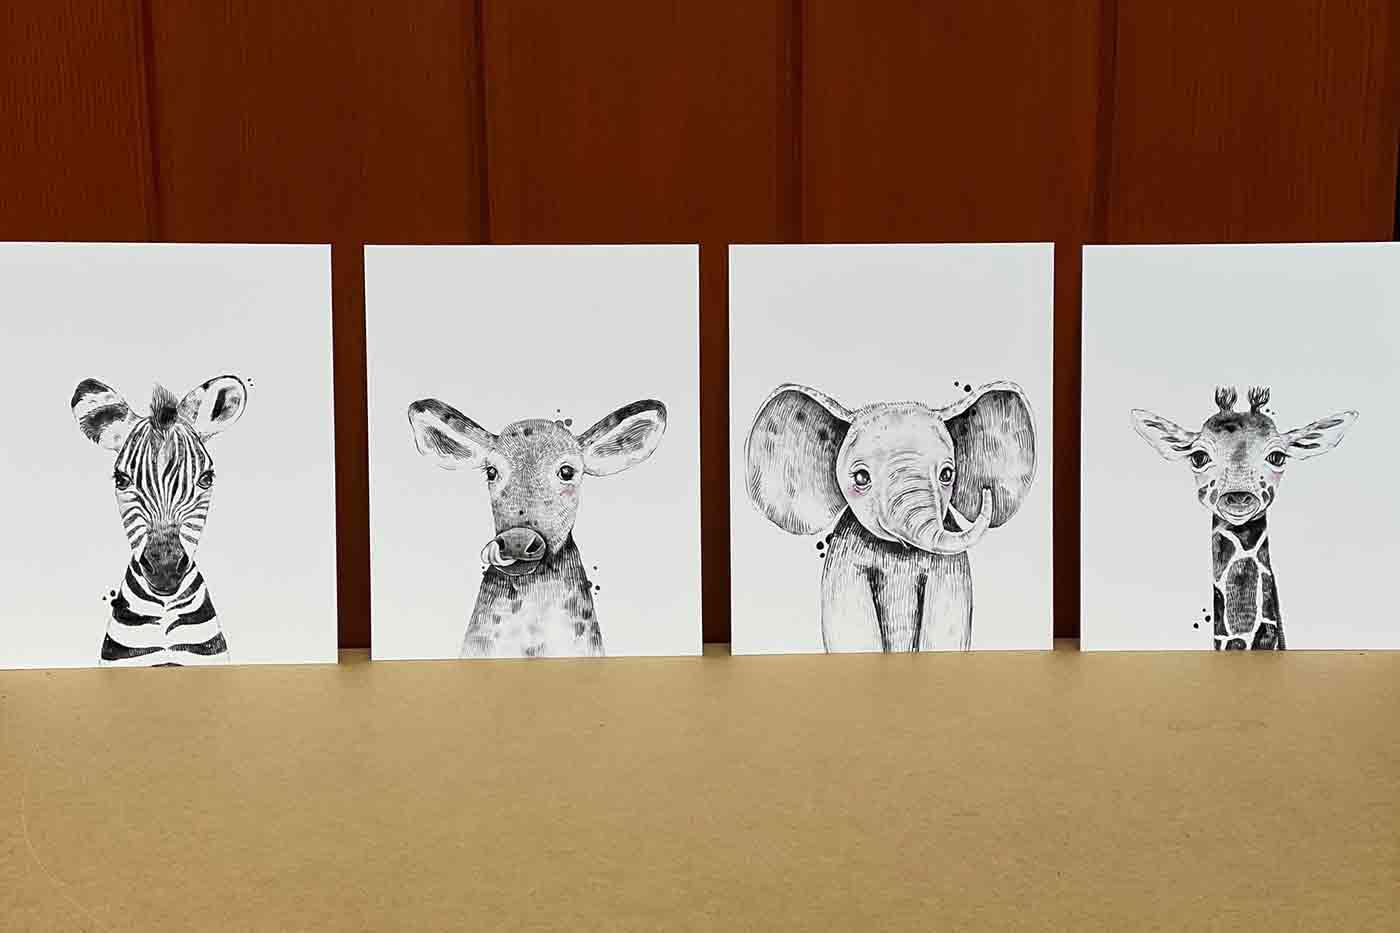 baby animal artwork for a nursery including a baby zebra a baby cow a baby elephant and a baby giraffe